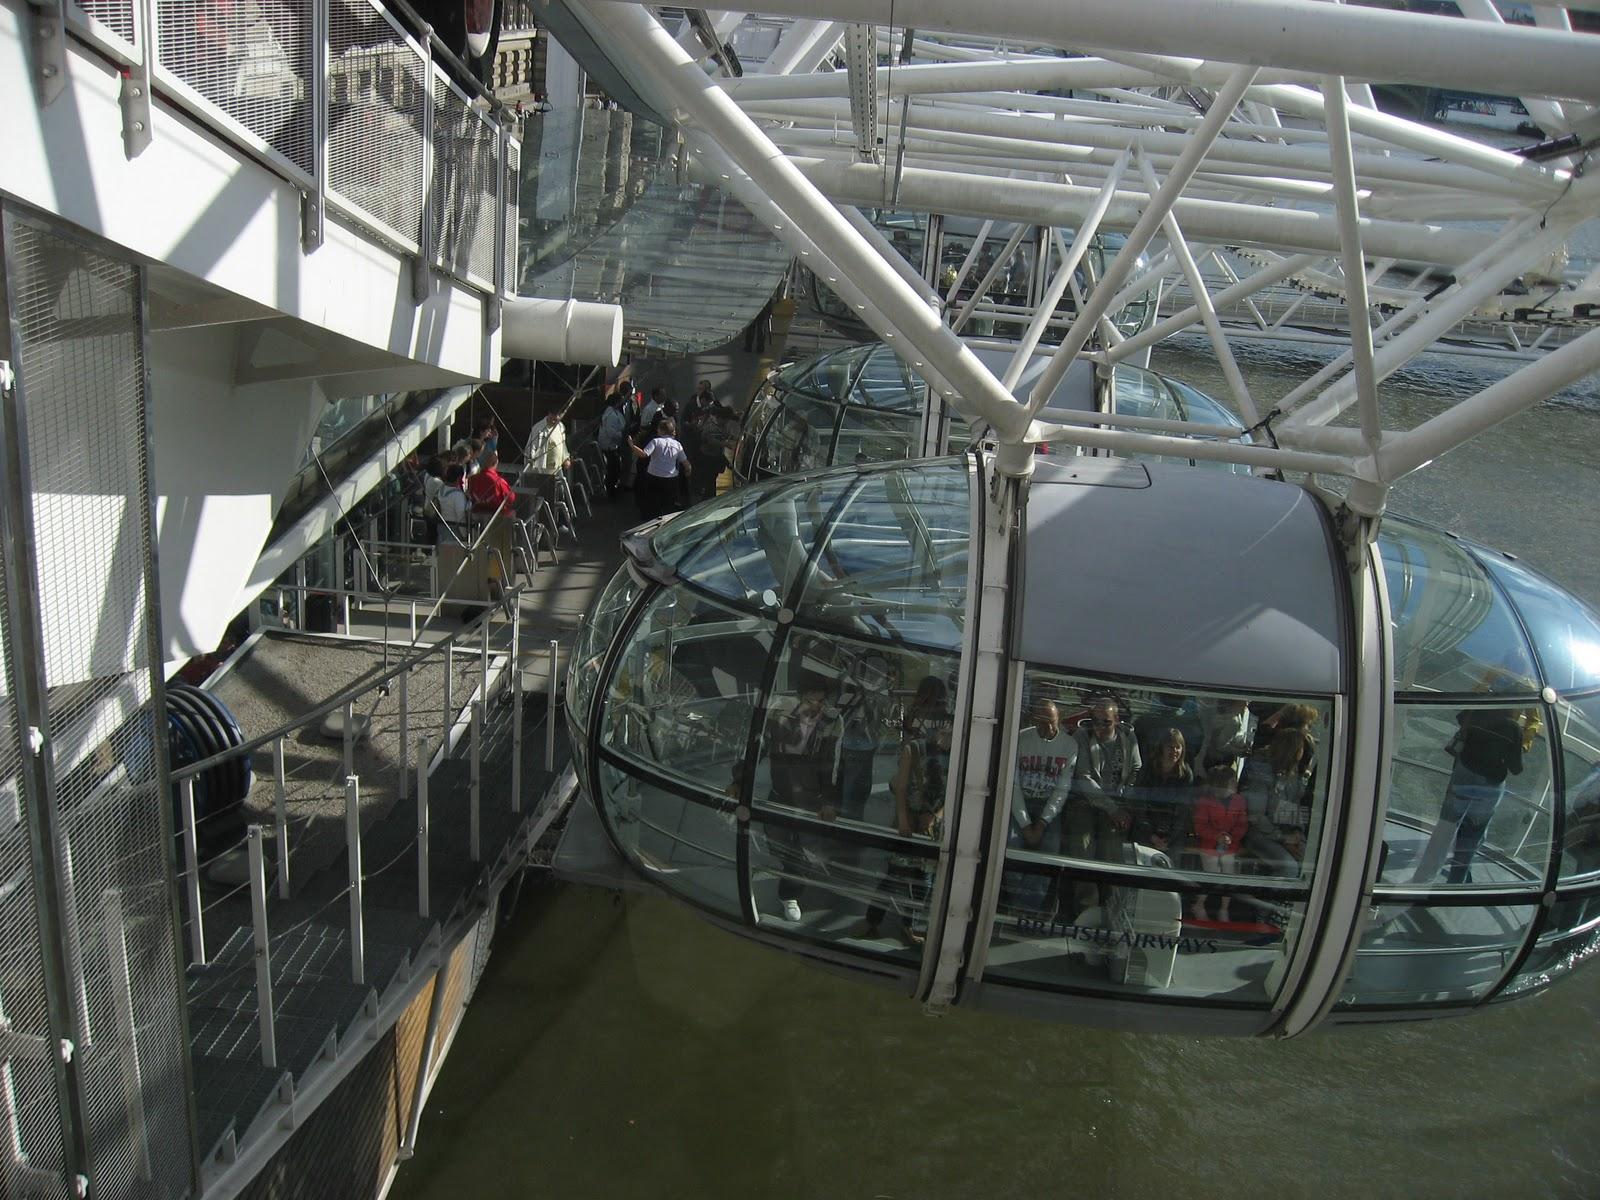 The Copenhagen Wheel >> merry-go-round: London Eye Research